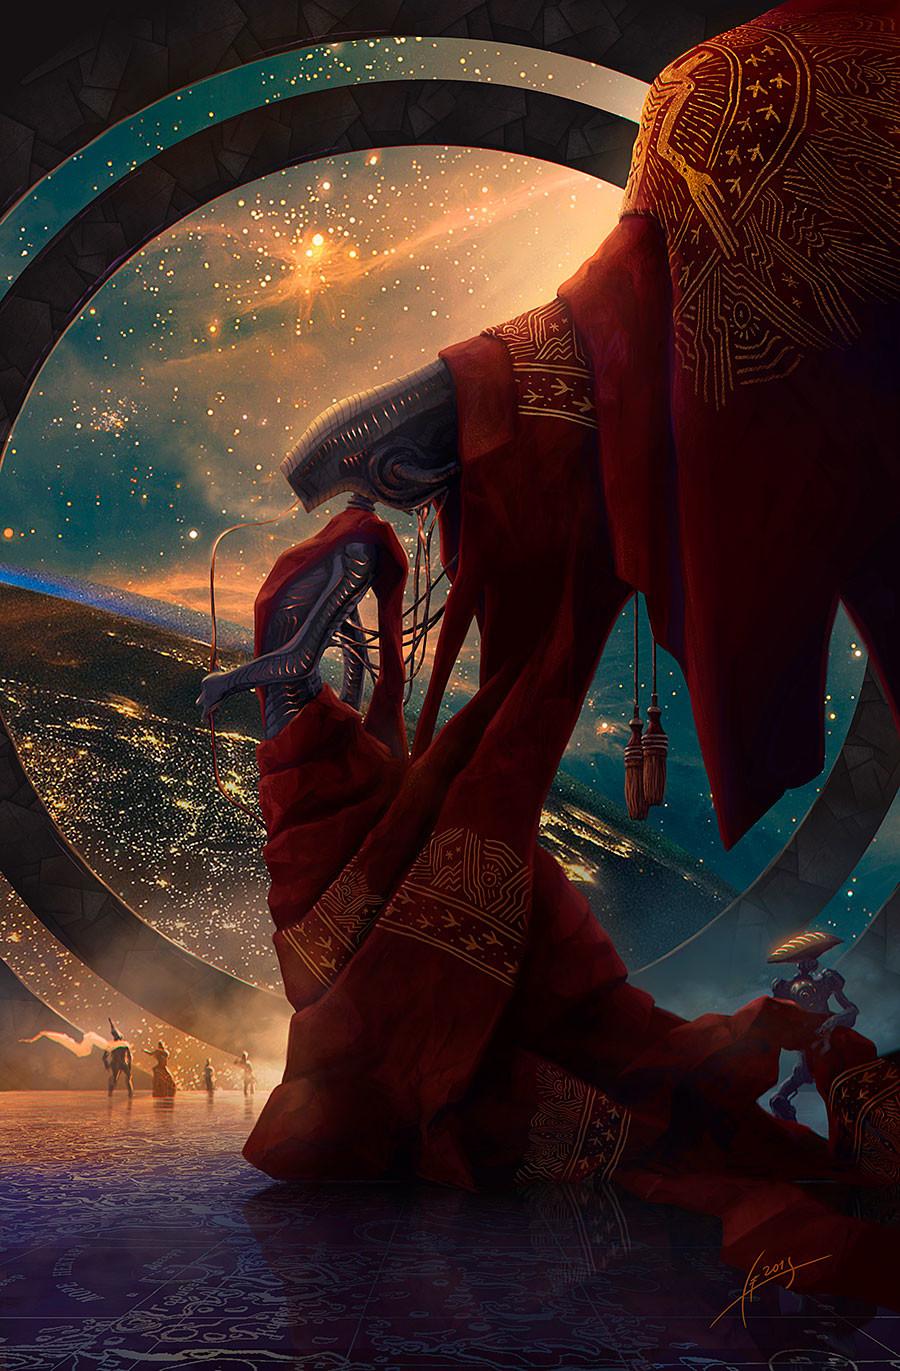 Alexey Egorov Digital Art Fantasy Art Robot Aliens Space 900x1371